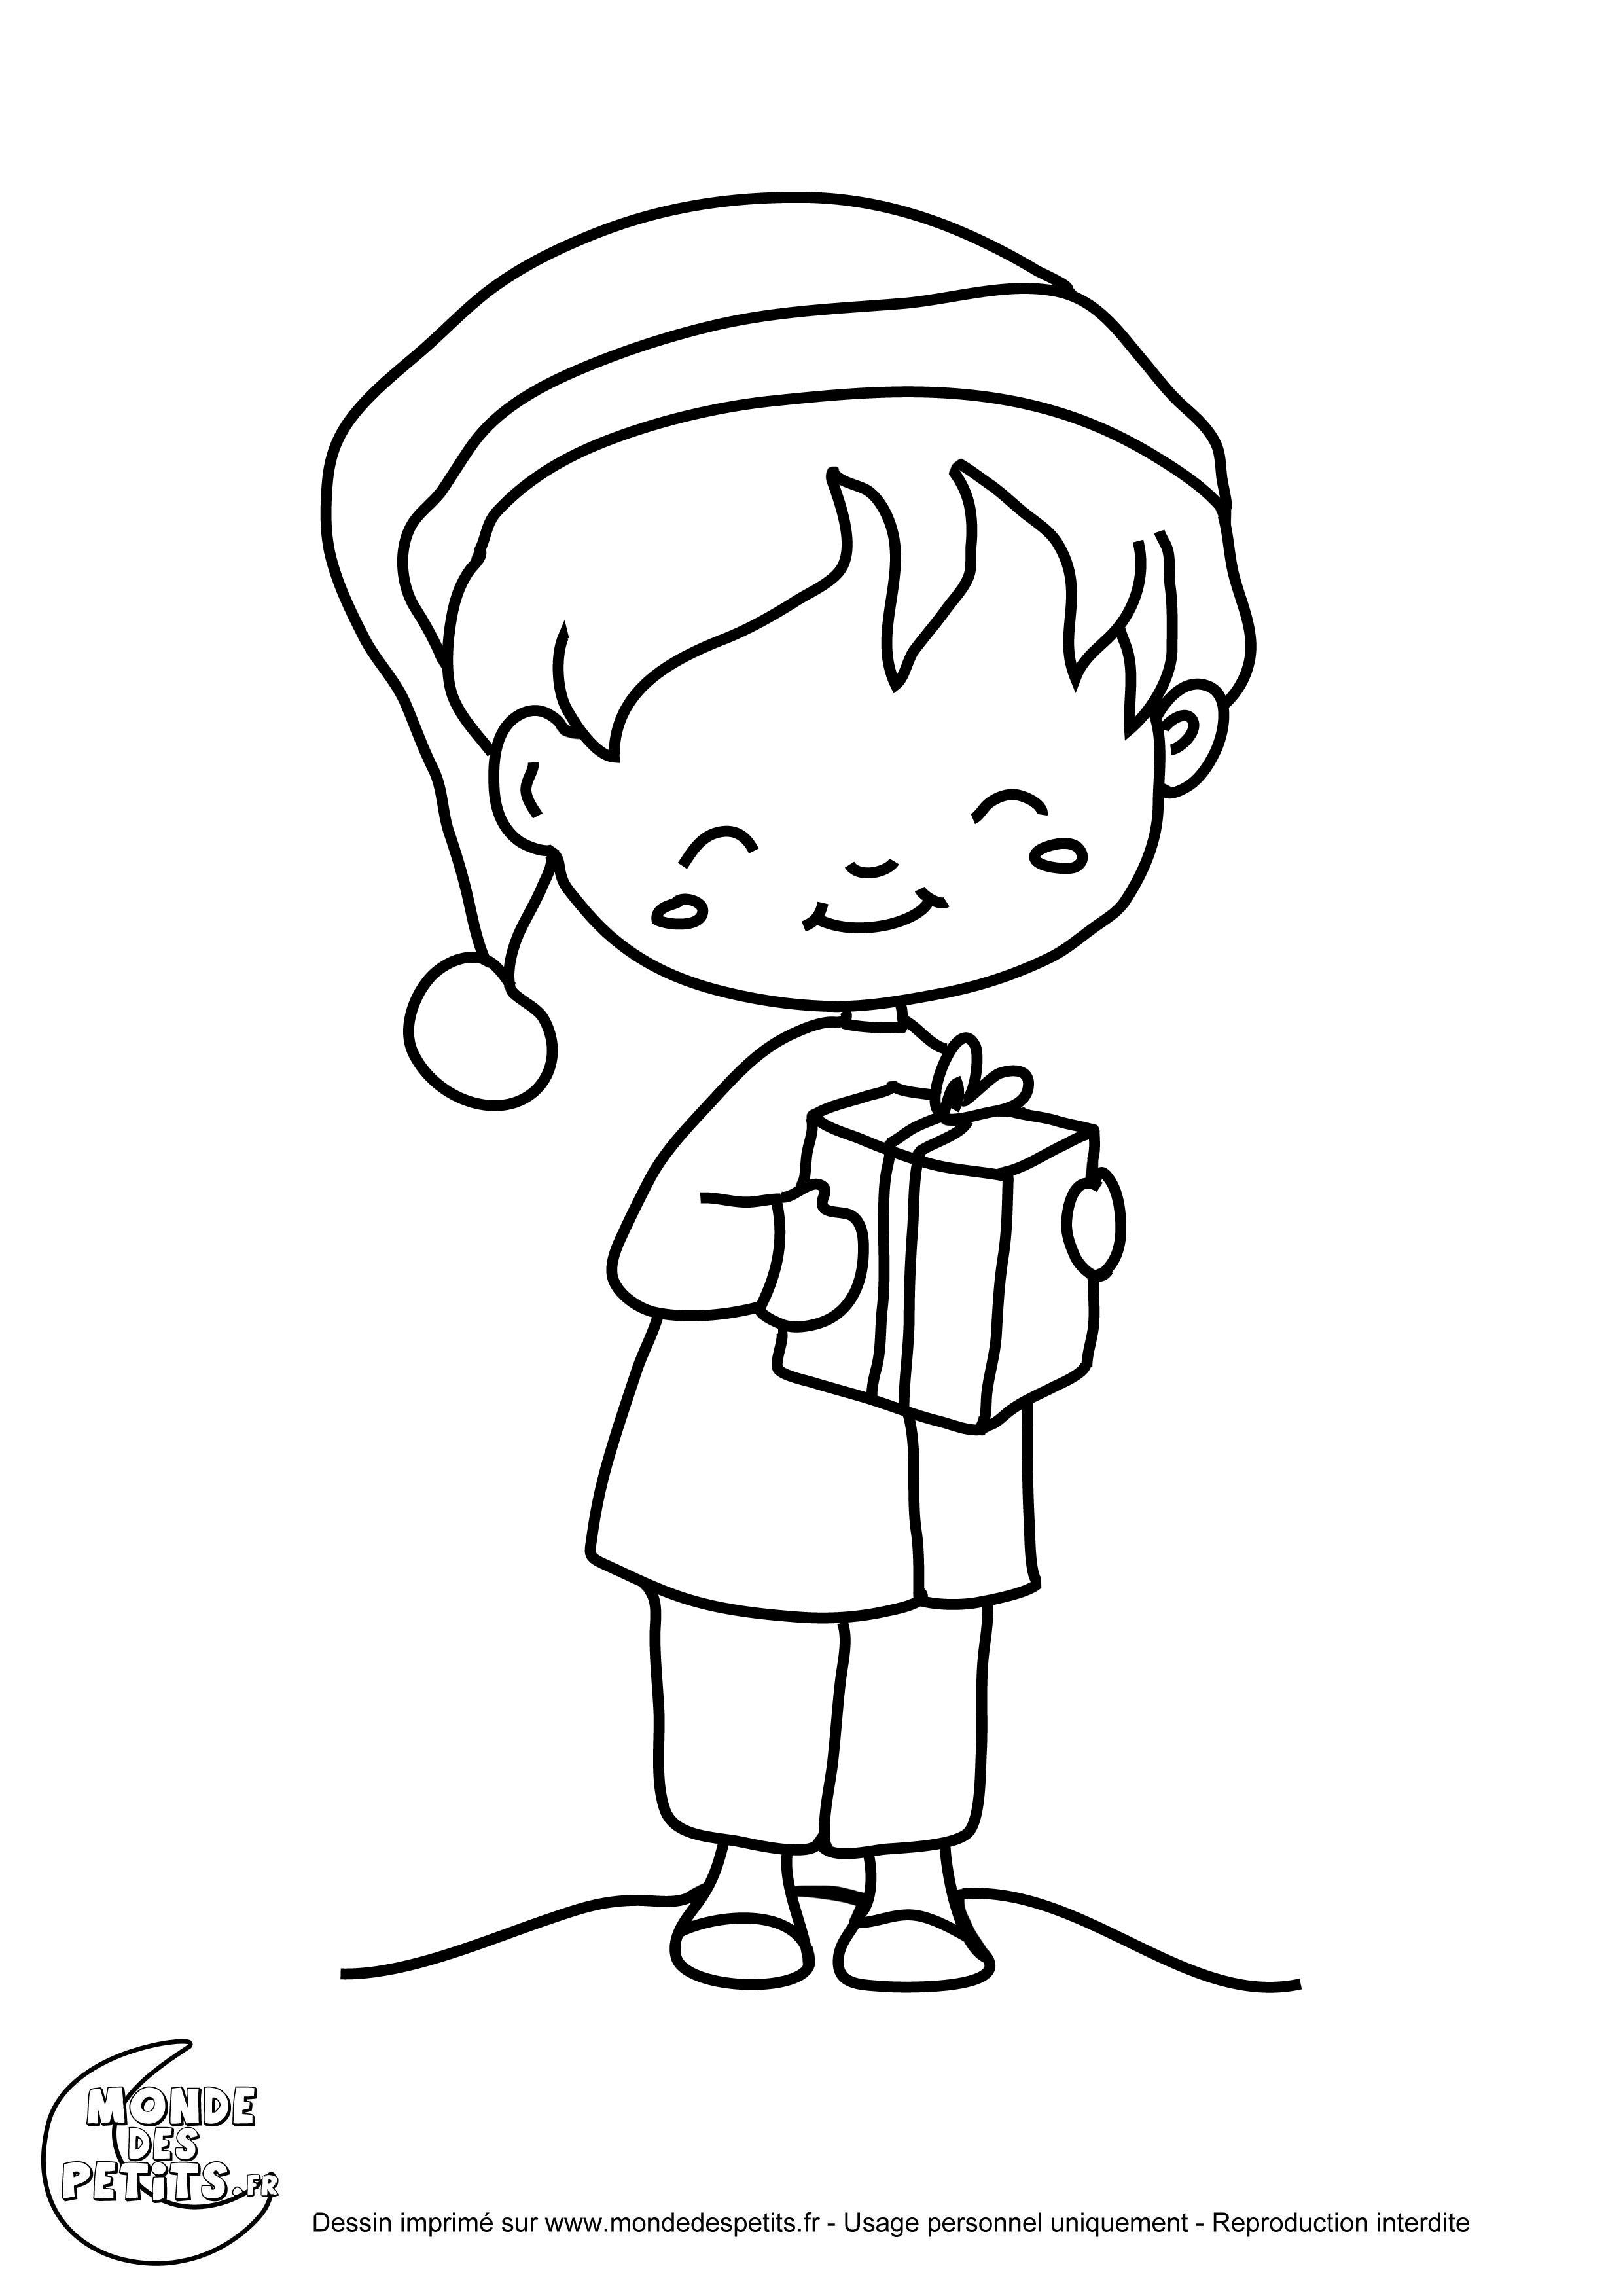 Meilleur de coloriage de cadeau noel - Cadeau coloriage ...